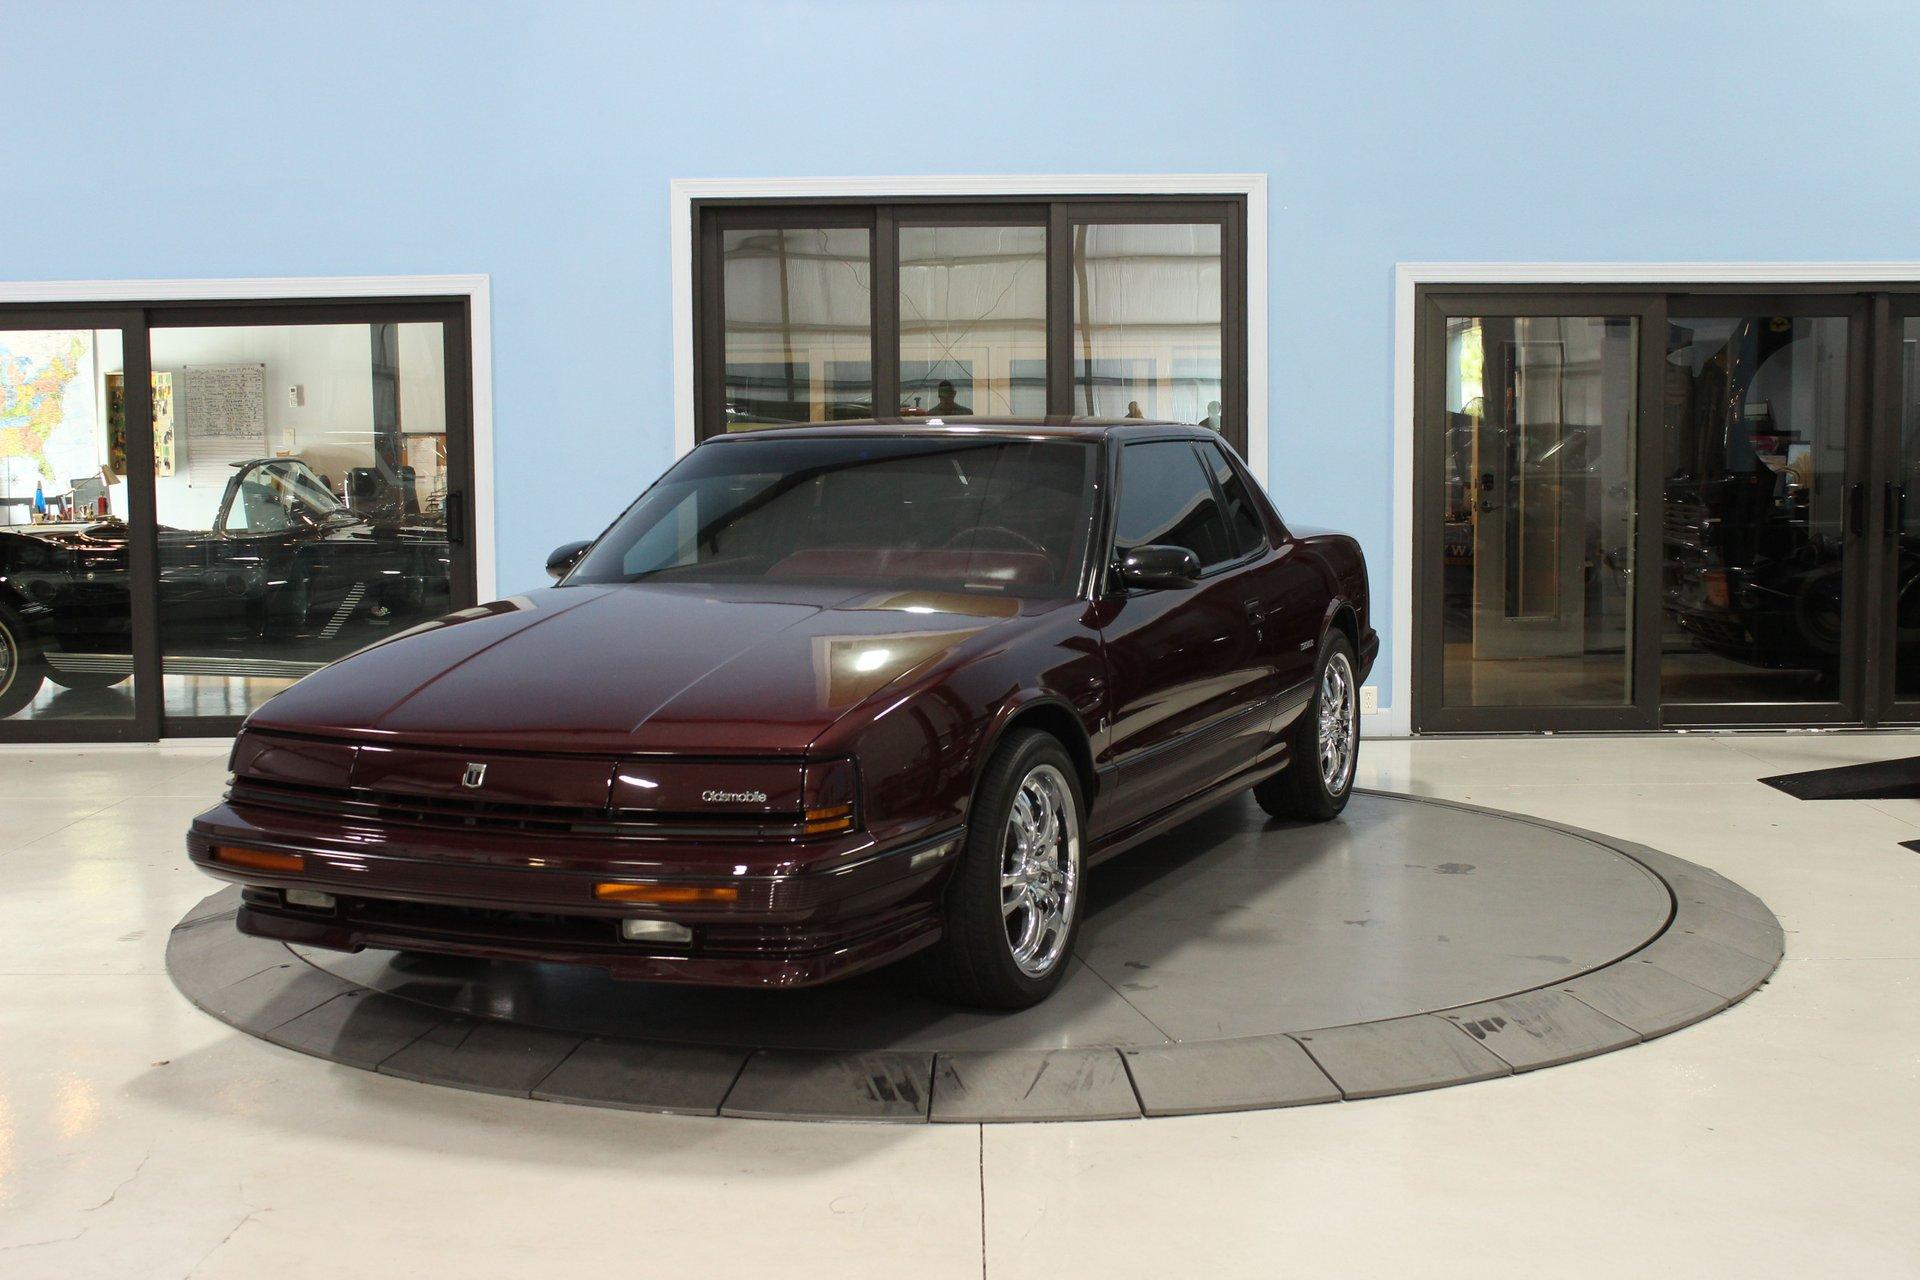 1991 oldsmobile toronado 2dr coupe trofeo